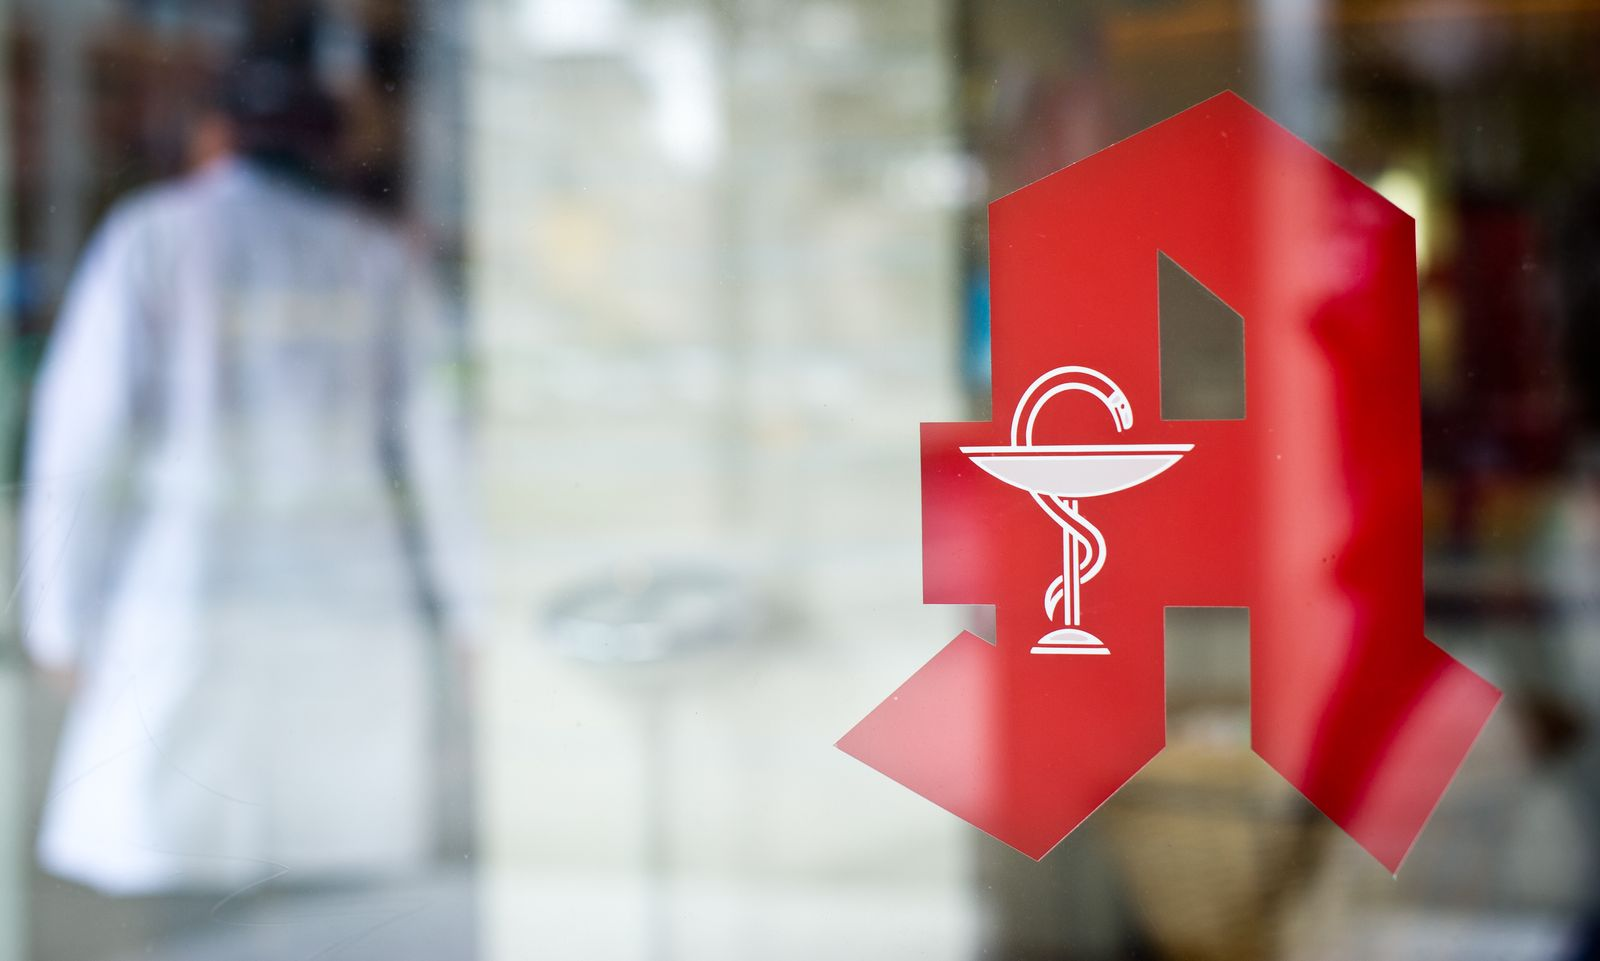 Arzneimittelmarktreform / Apotheken-Logo / Apotheker